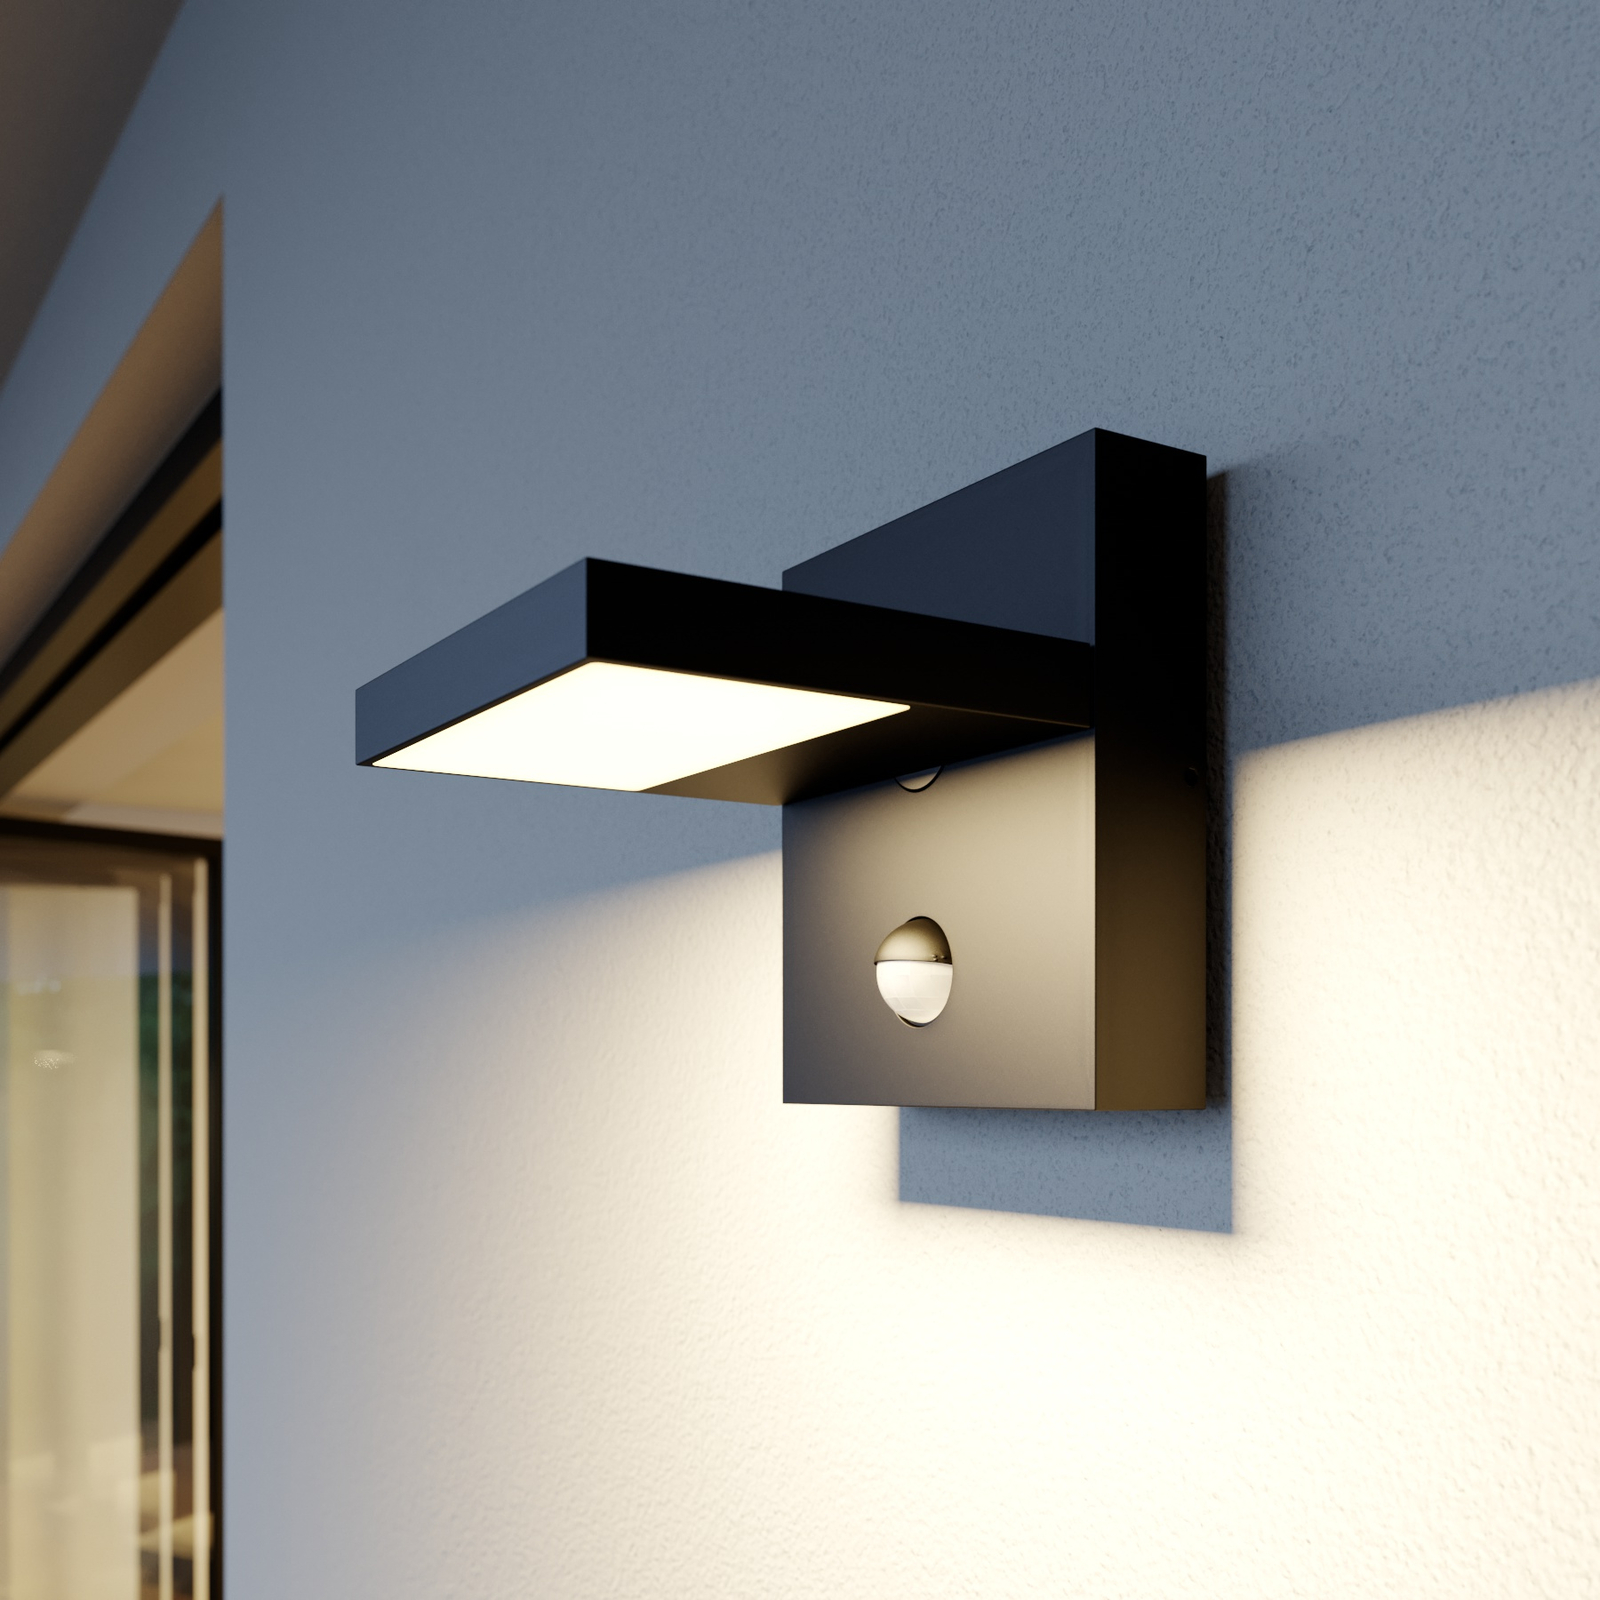 Aplique LED de exterior Silvan gris oscuro sensor